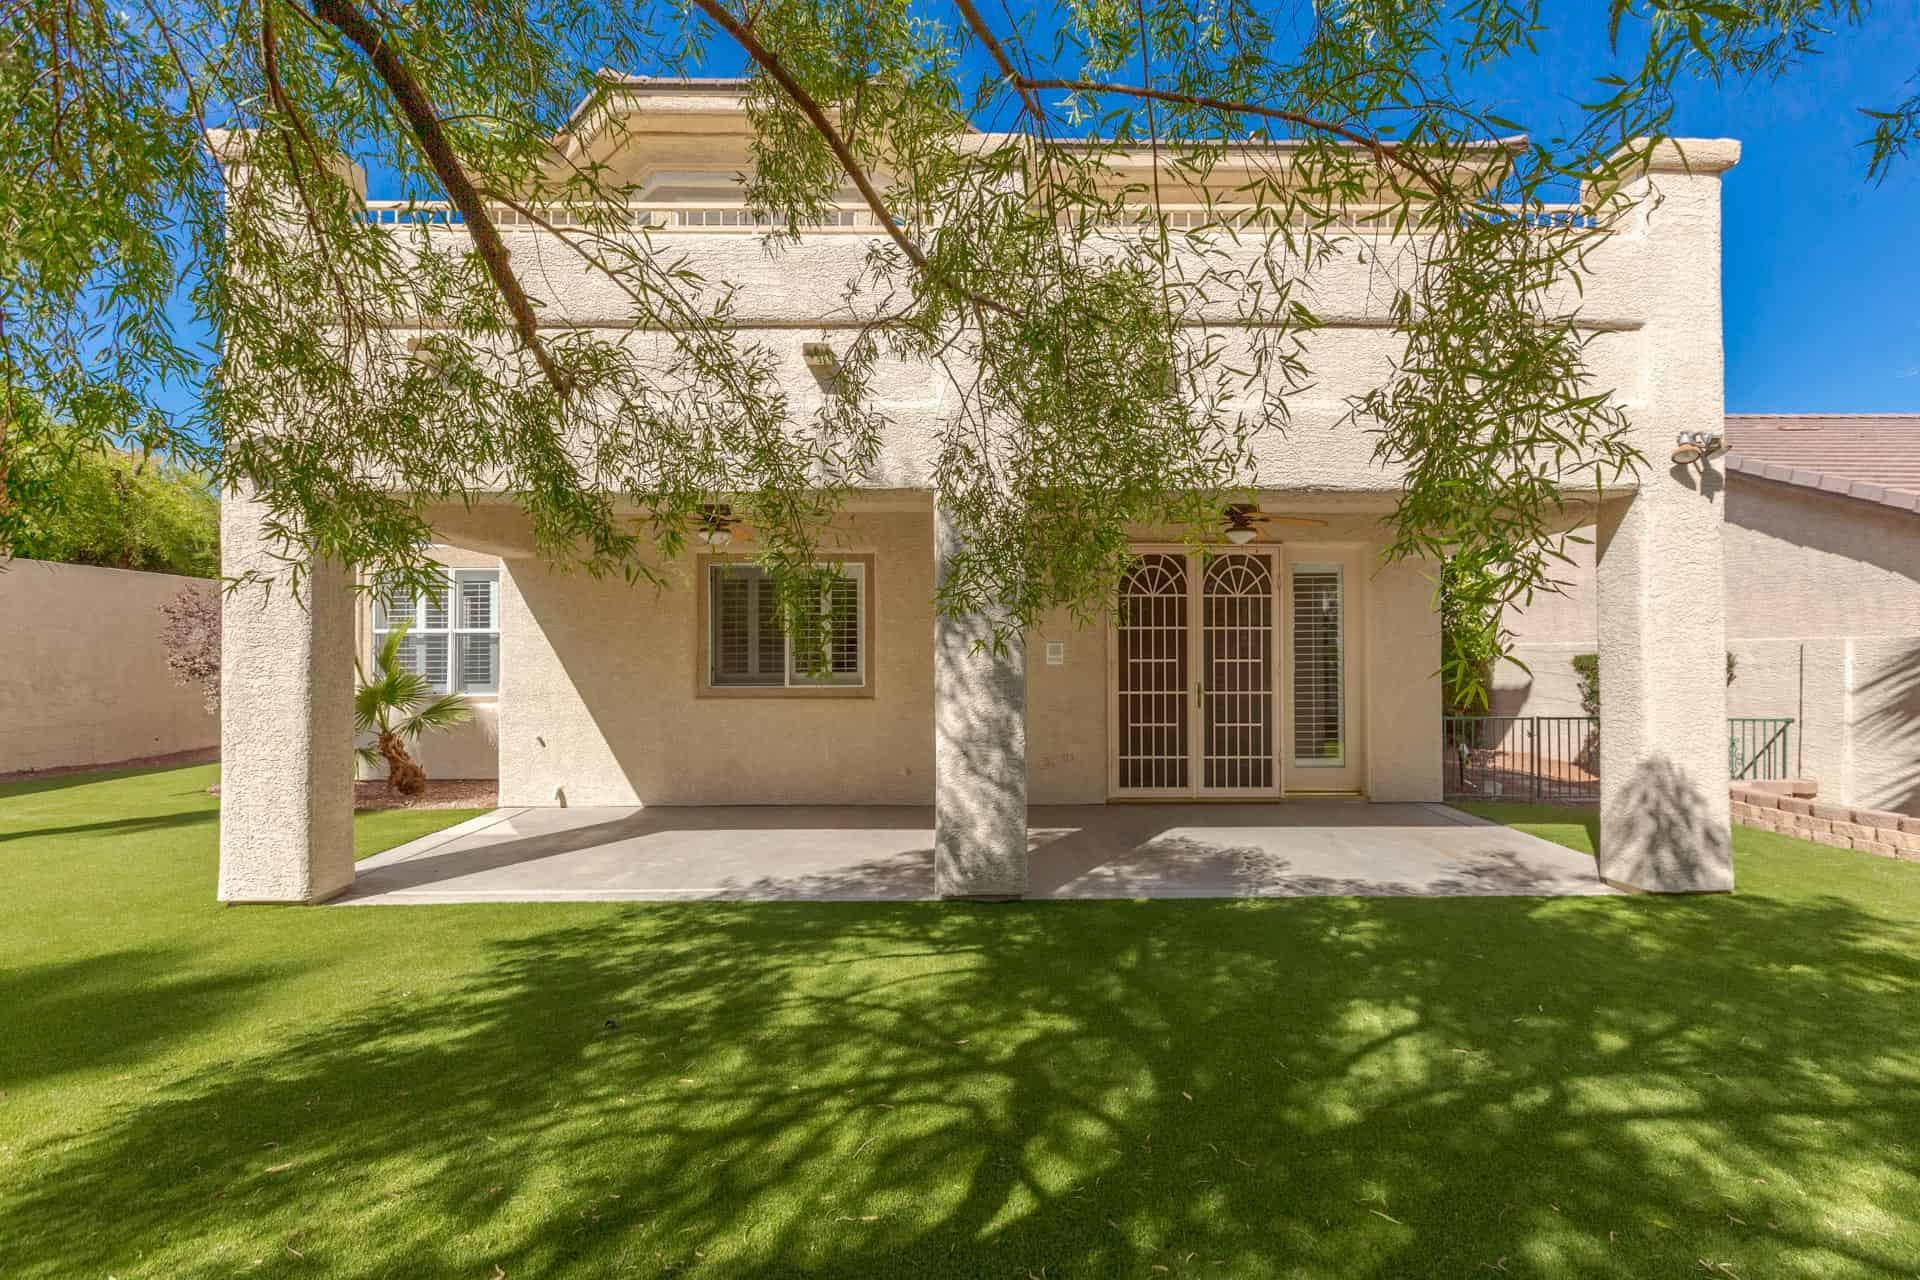 las-vegas-luxry-real-estate-realtor-rob-jensen-company-10729-grey-havens-court-willow-creek5357